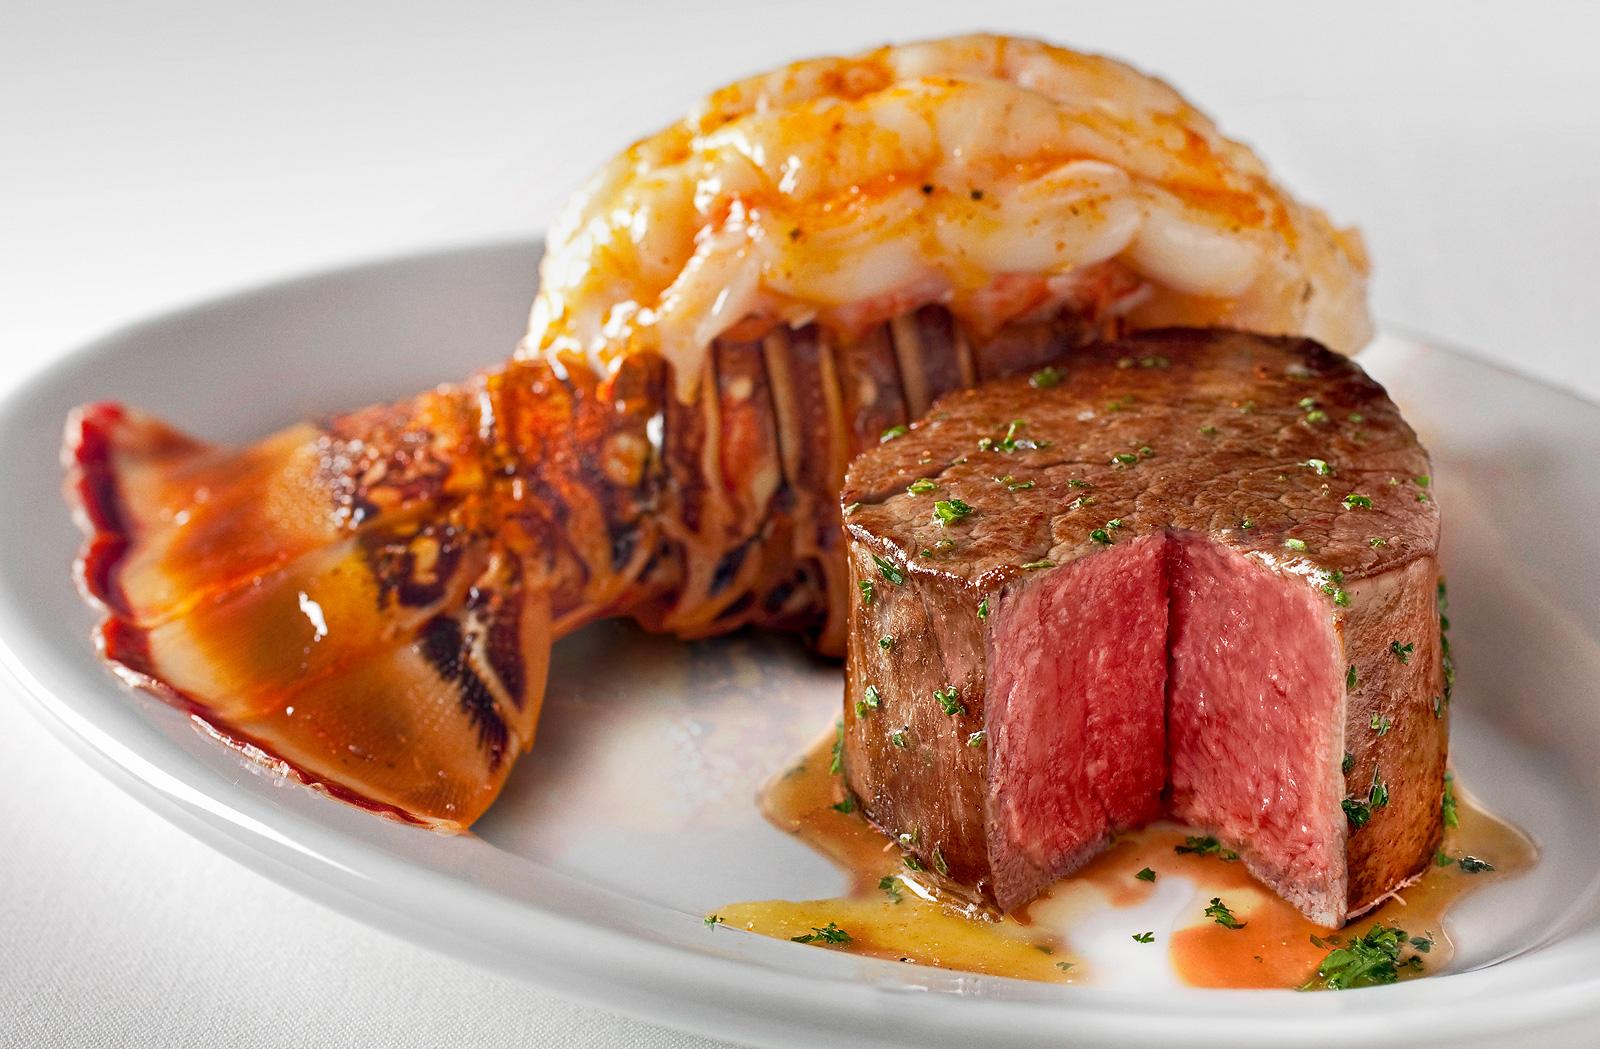 Penfolds Wine Dinner At Ruth's Chris Steak House | cravedfw